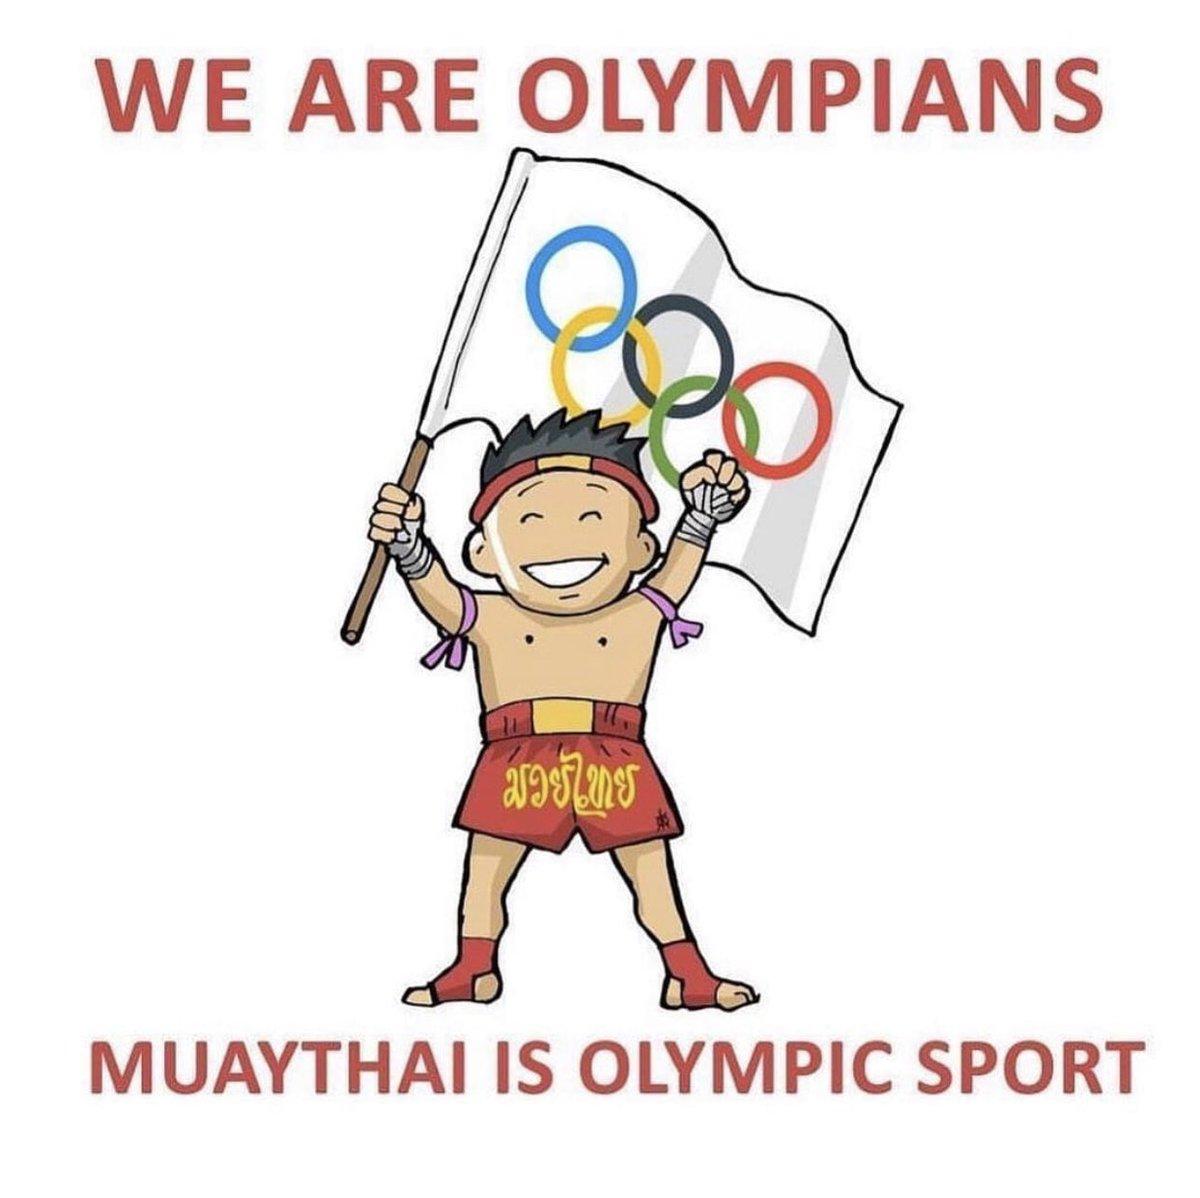 Congratulations #MUAYTHAI is recognized by the IOC as an Olympic Sport! ❤️💪🏻 muaythai_kyrgyzstan_03  Поздравляем #Муайтай официально признан Олимпийским видом спорта! https://t.co/LFWsWRkPp7